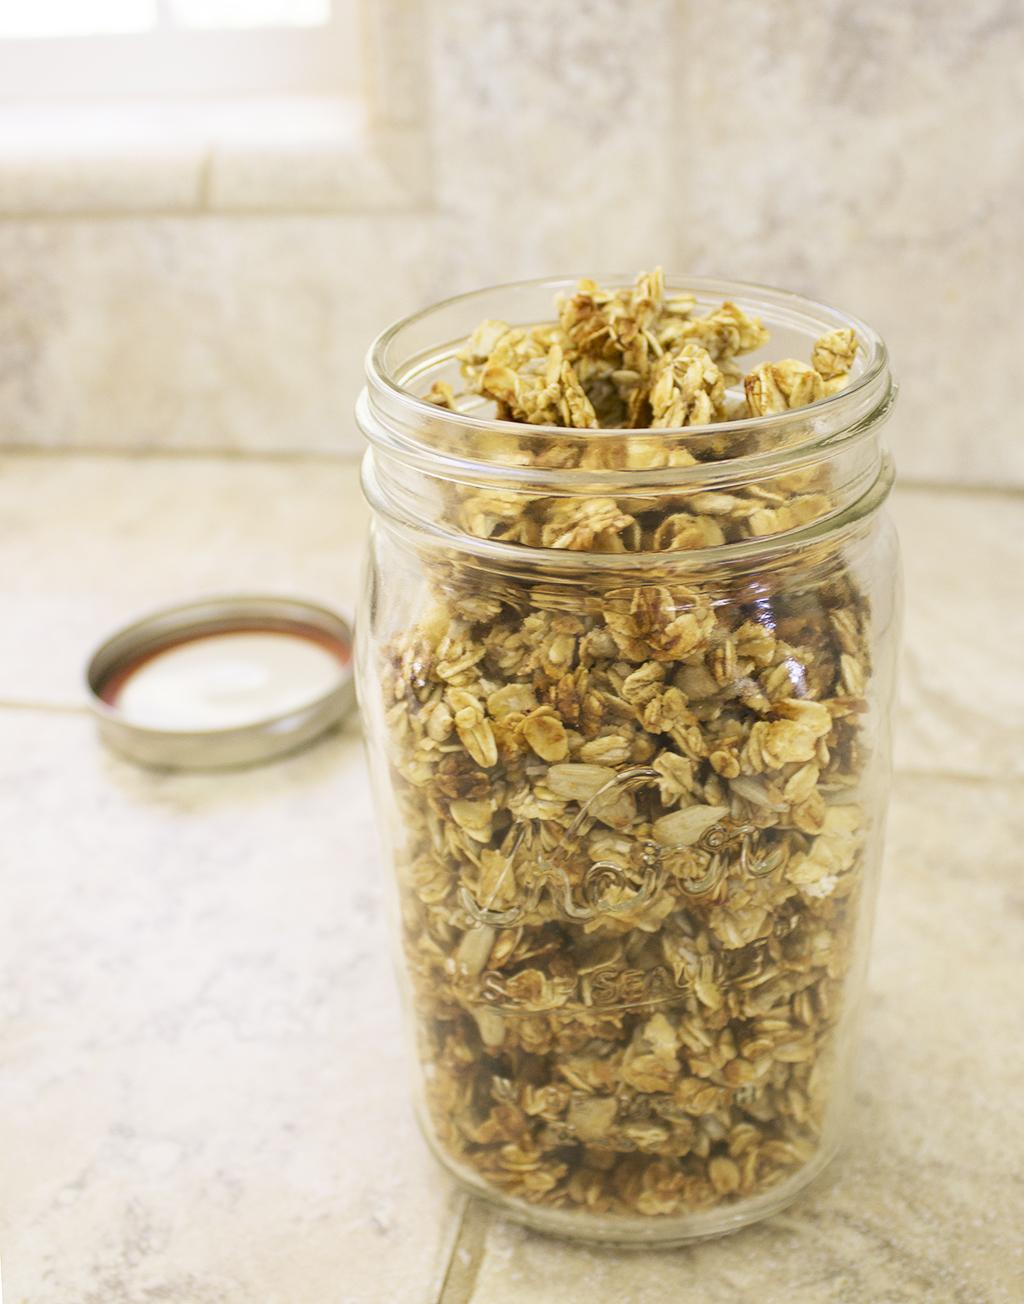 Healthy Vegan Crunchy Banana Granola In Jar